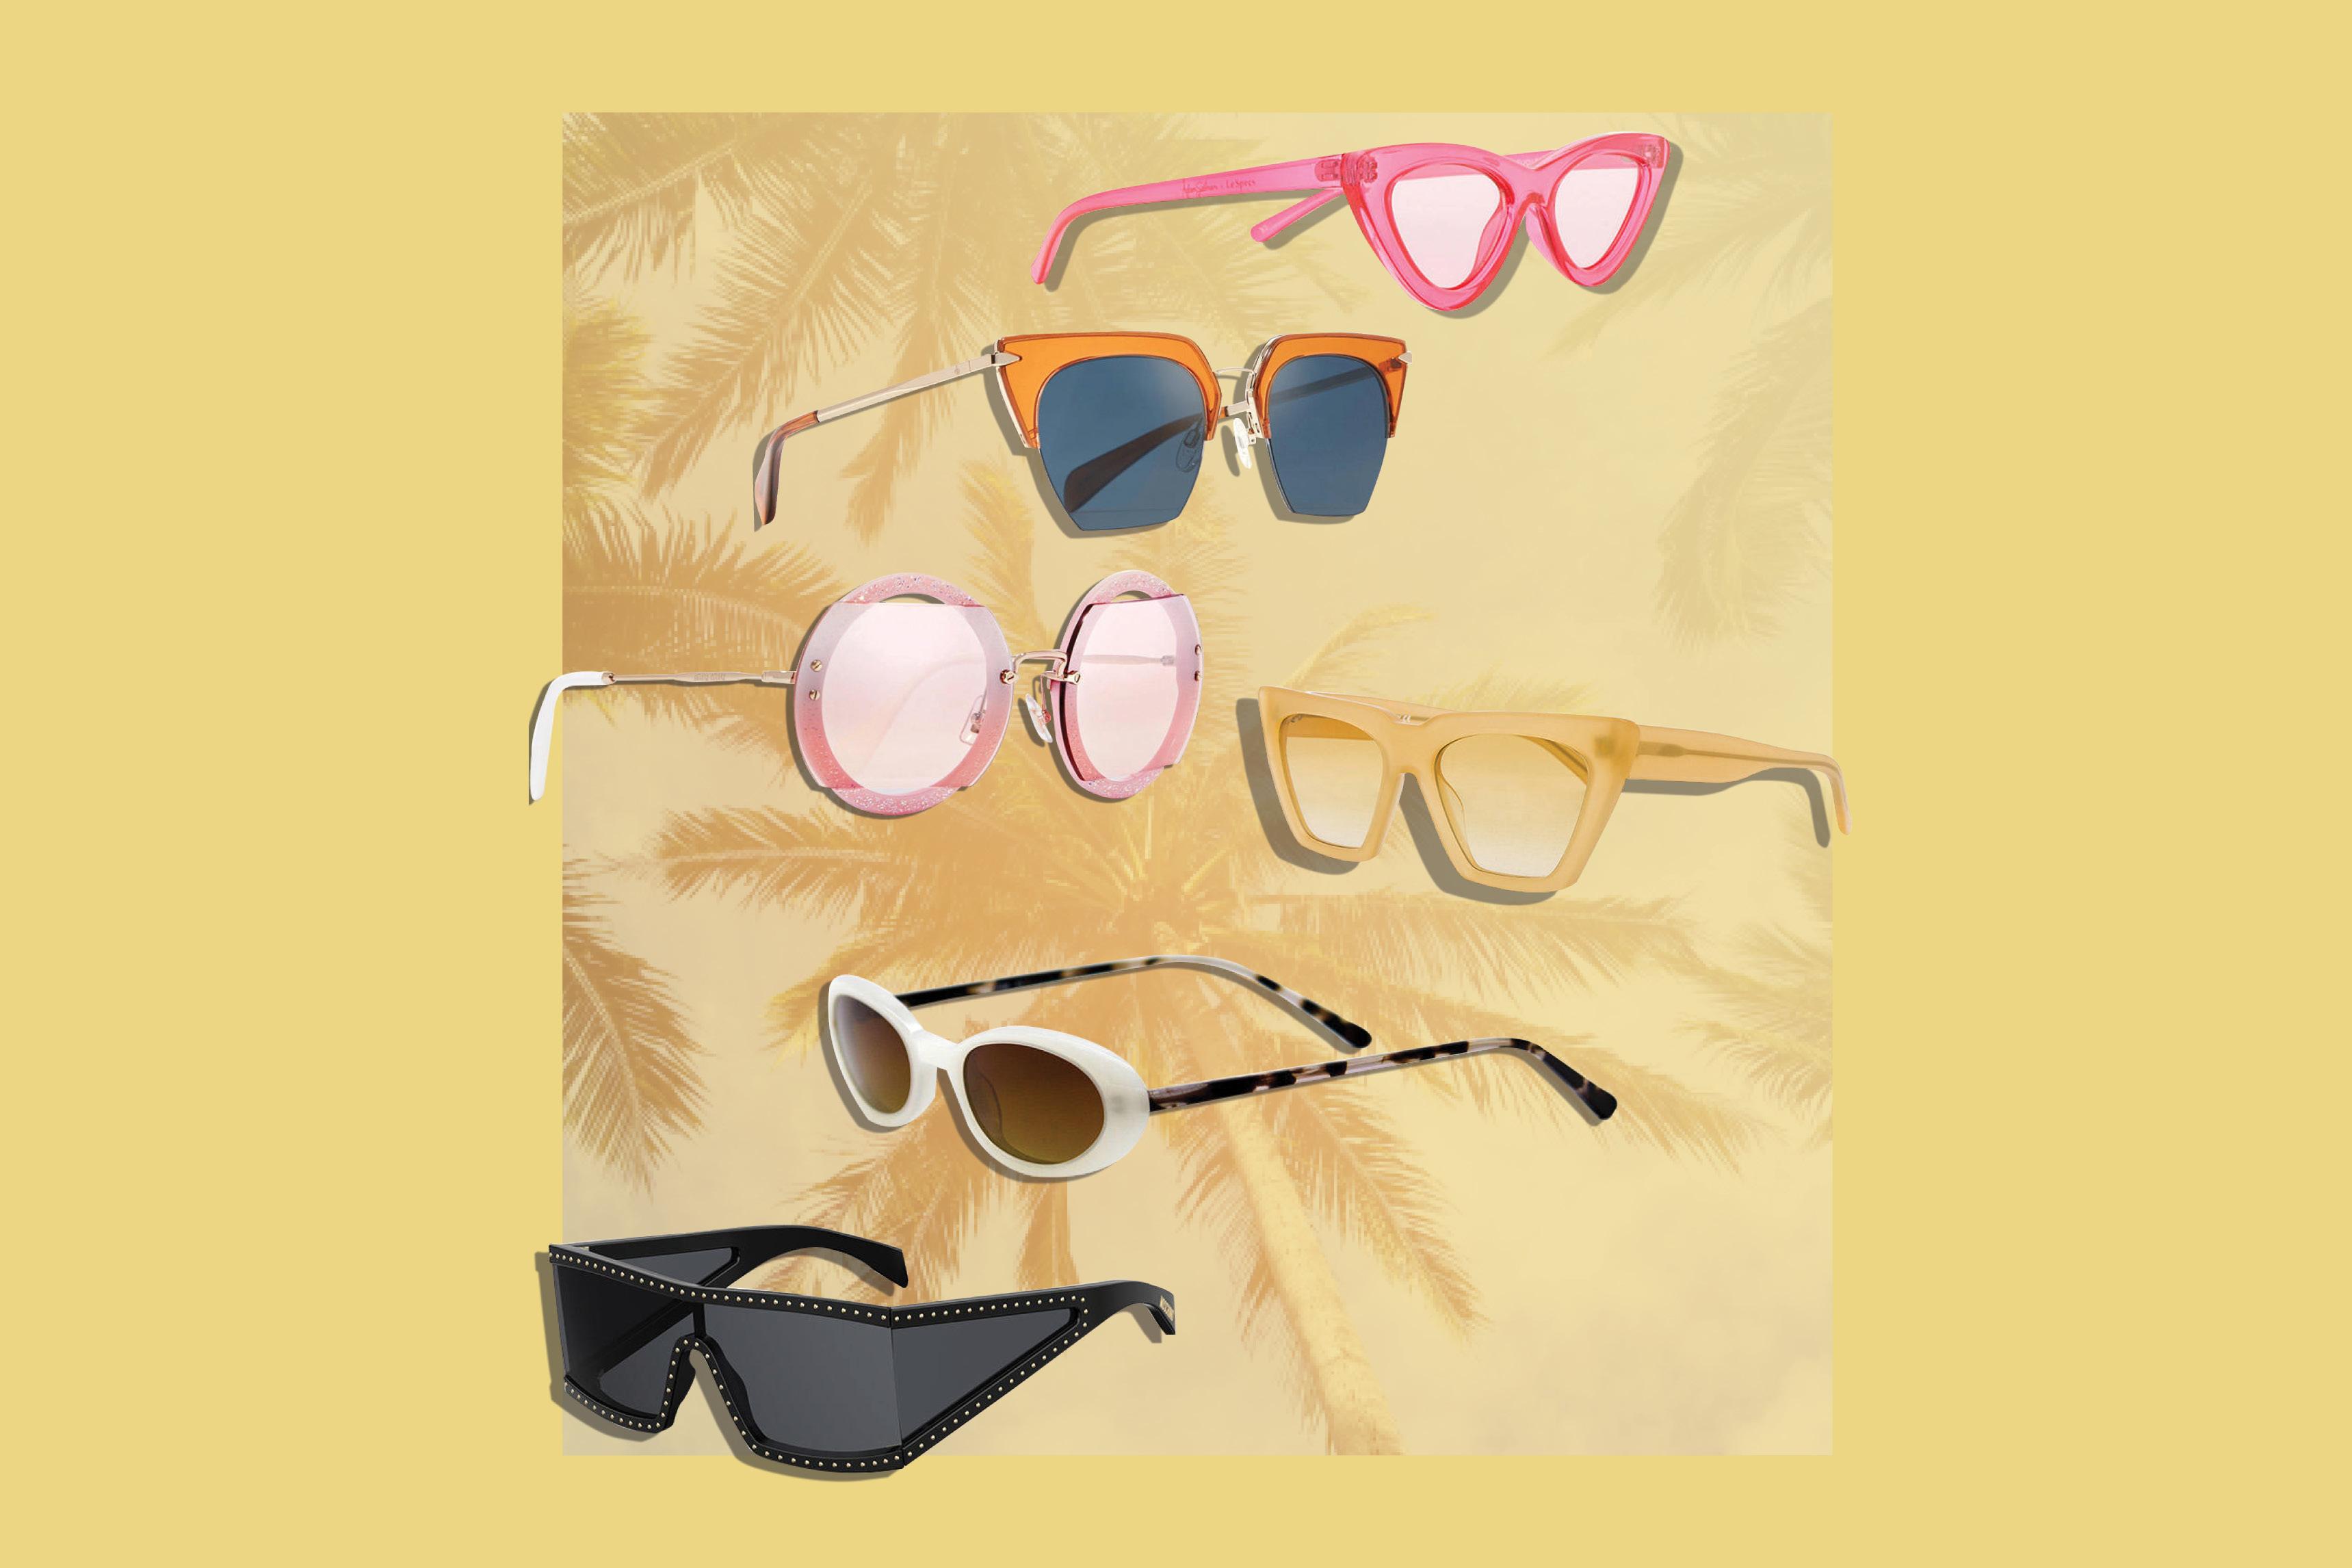 c29b23d5-f8e5-4b4a-bcc0-7dd73c3ce65e-sunglasses-jpg